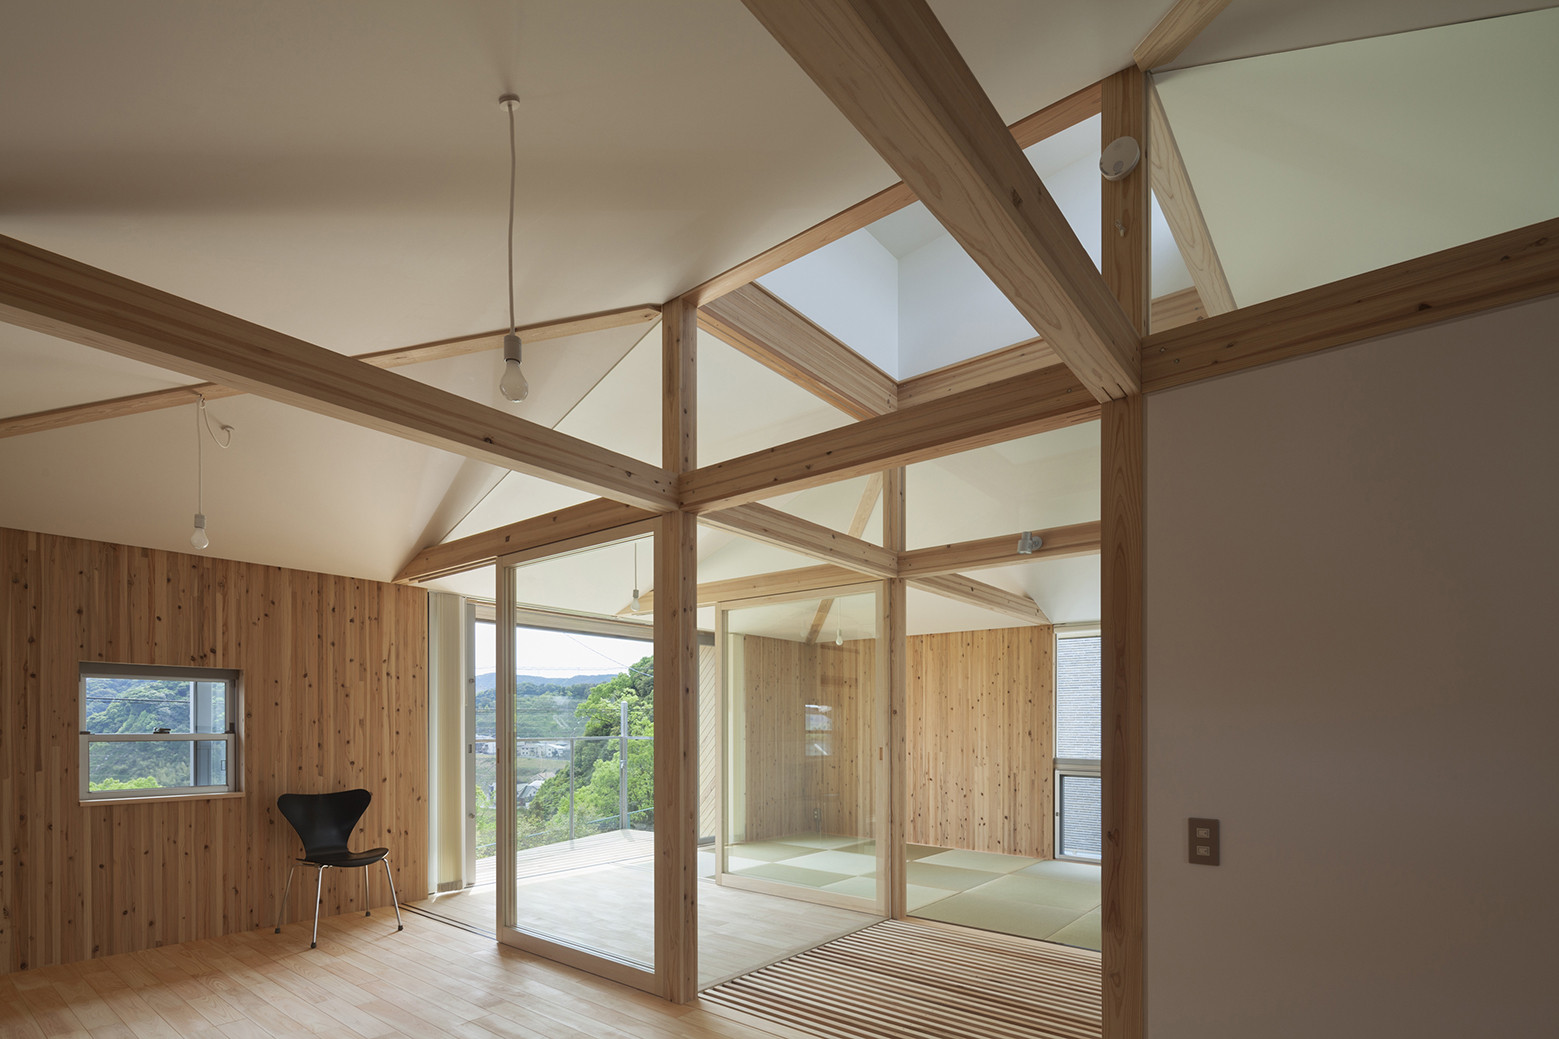 Casa Híbrida de Madera / Architecture Studio Nolla   Plataforma ...